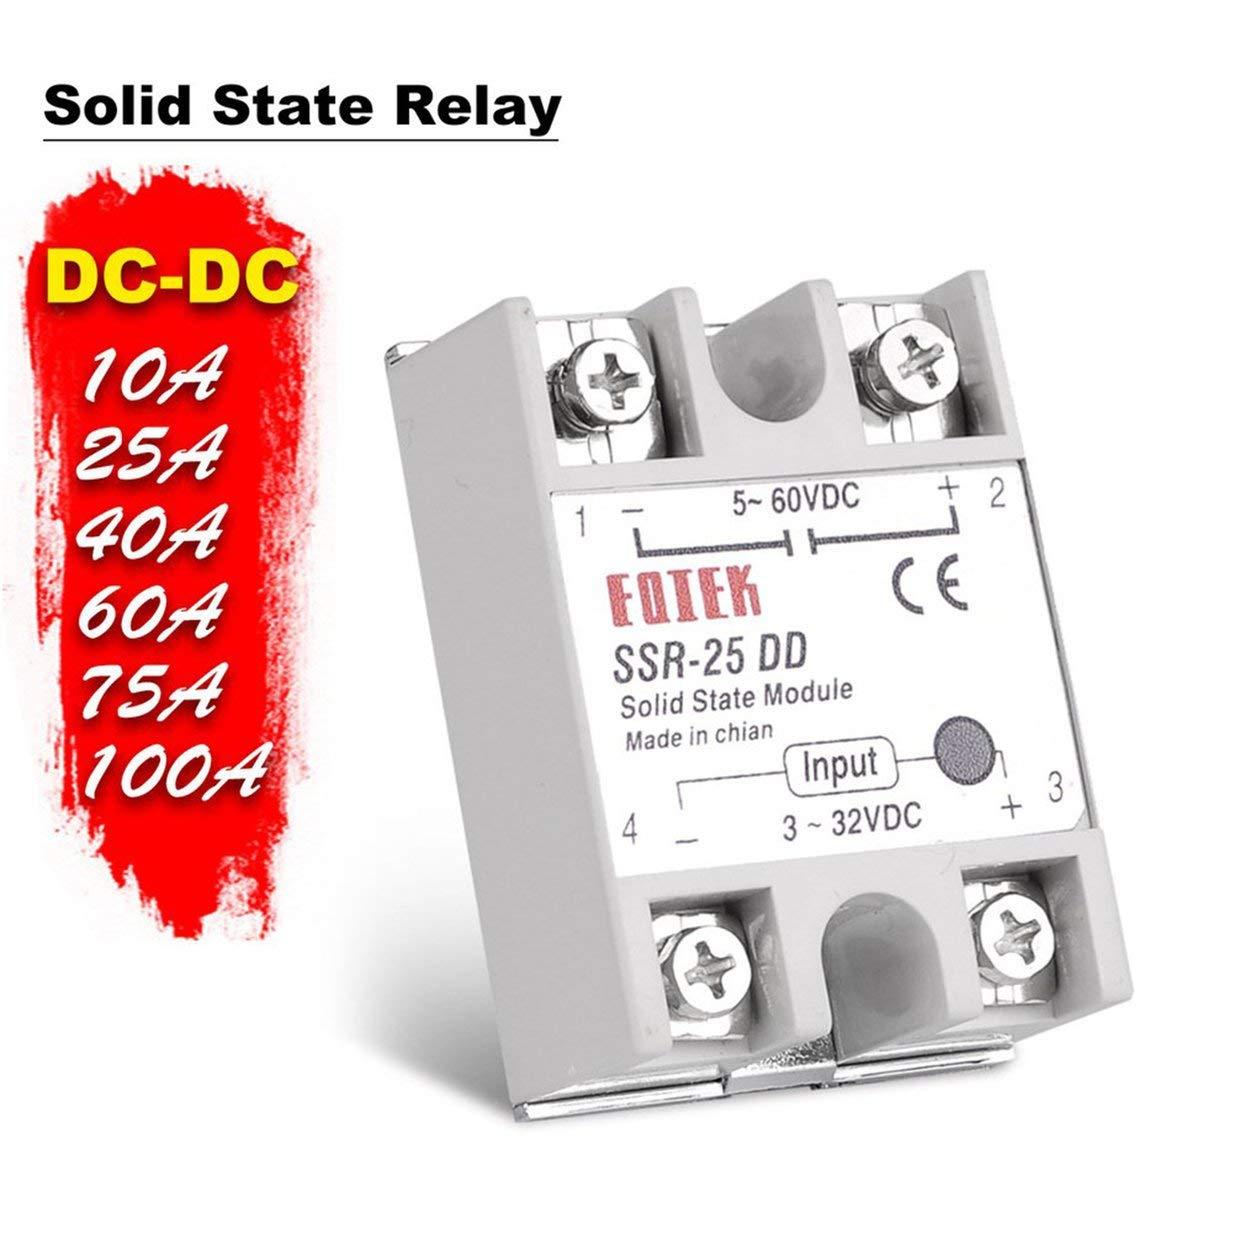 Tree-on-Life Solid State Relay SSR-10DD SSR-25DD SSR-40DD SSR-60DD SSR-80DD SSR-100DD 3-32V DC TO 5-60V DC SSR 3-25mA